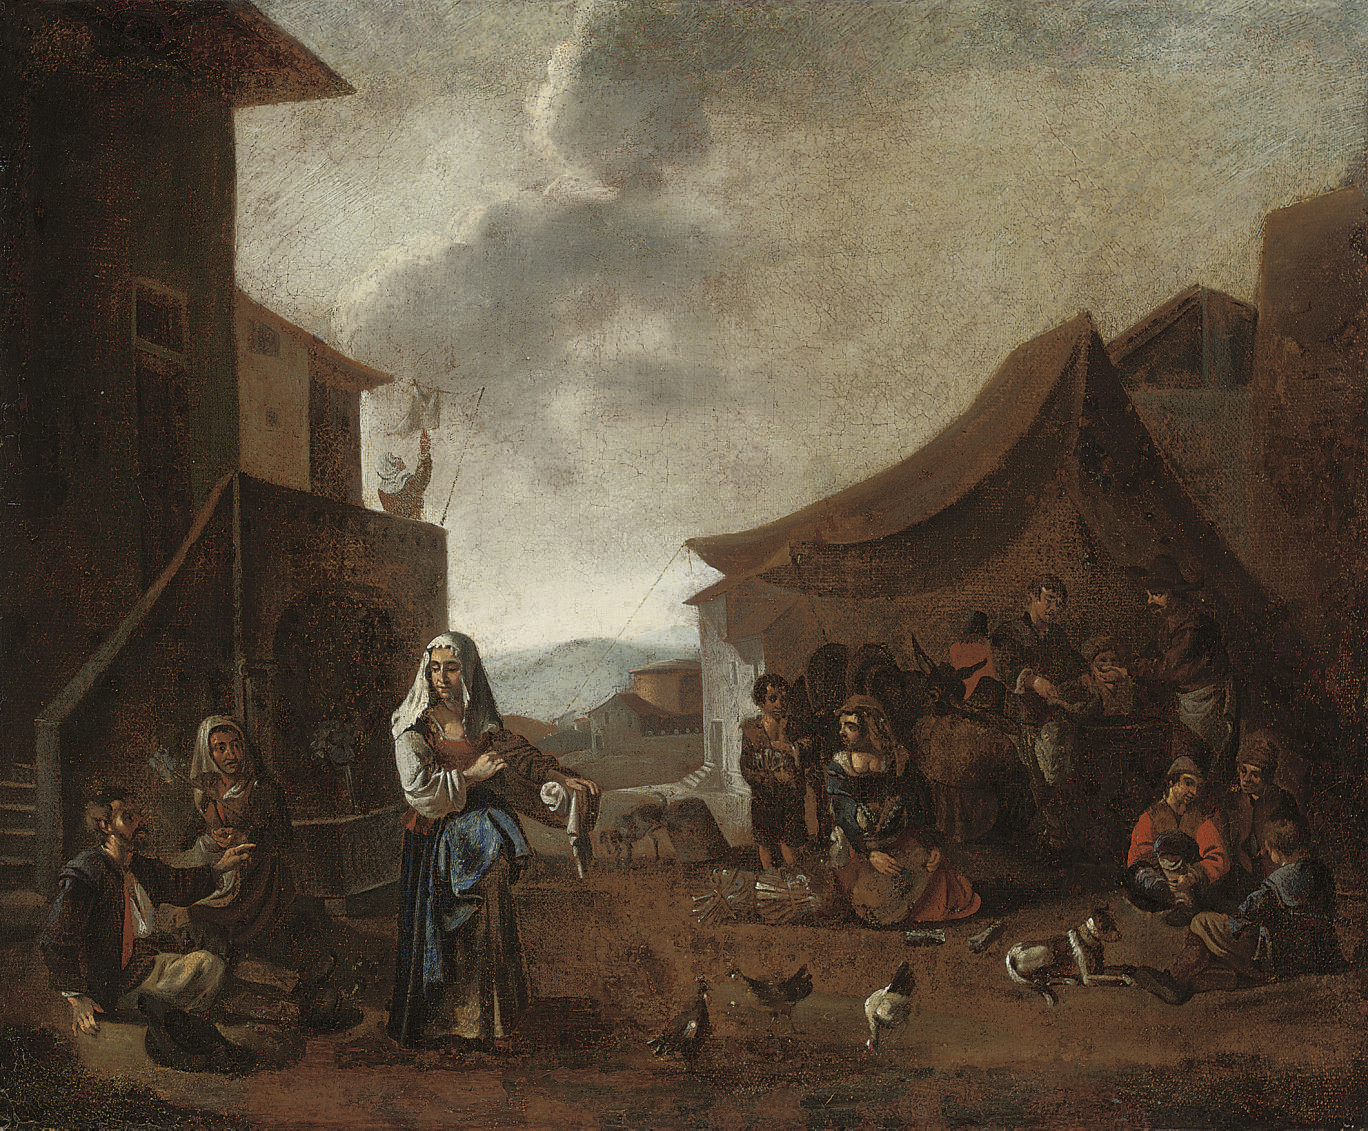 Peasants in a village square